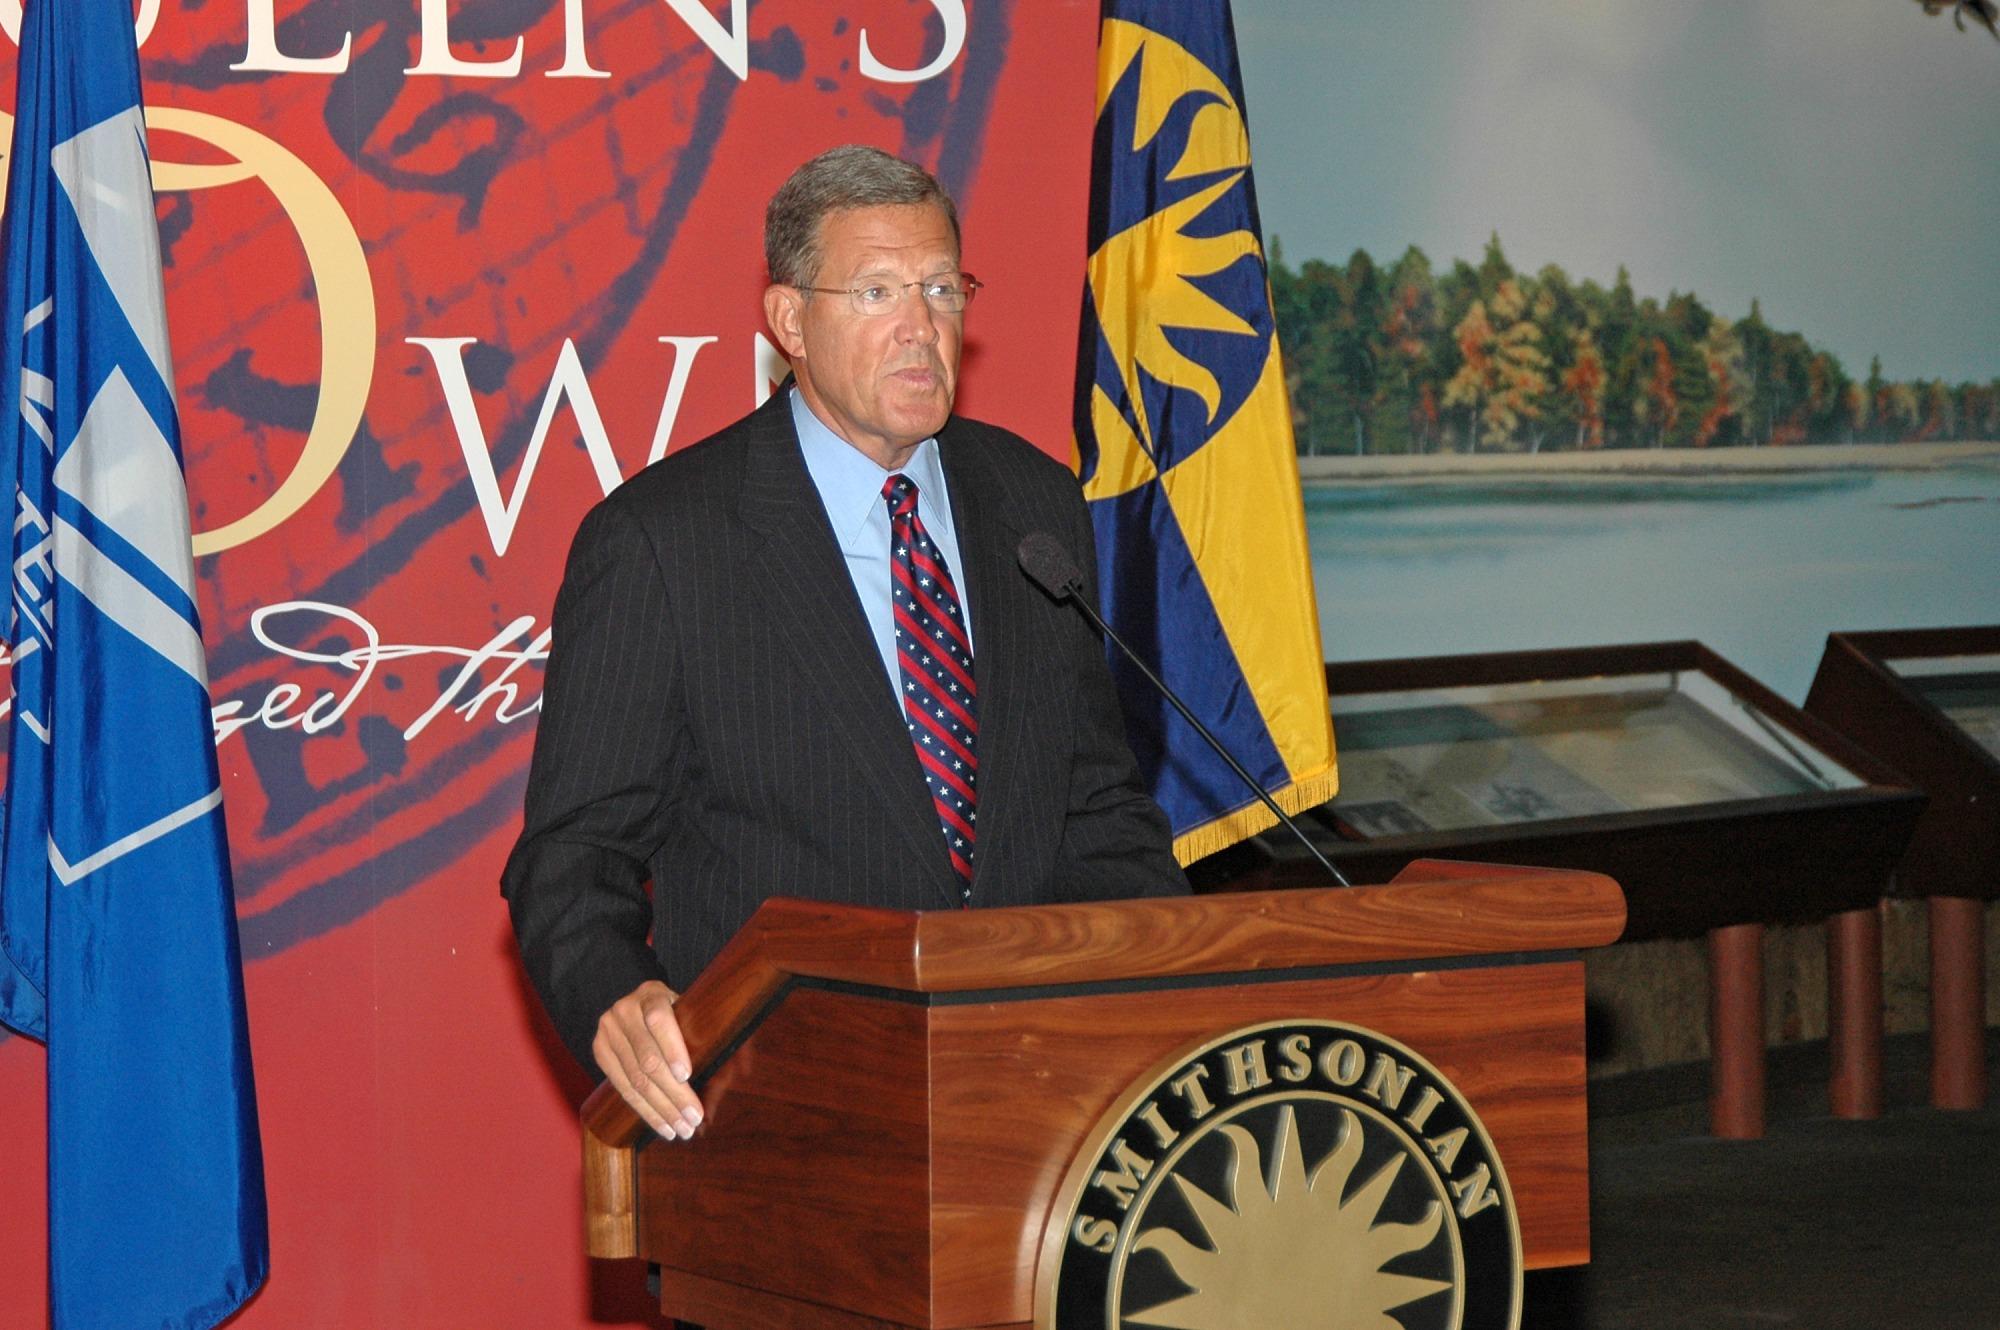 Smithsonian Reception Honoring USPS